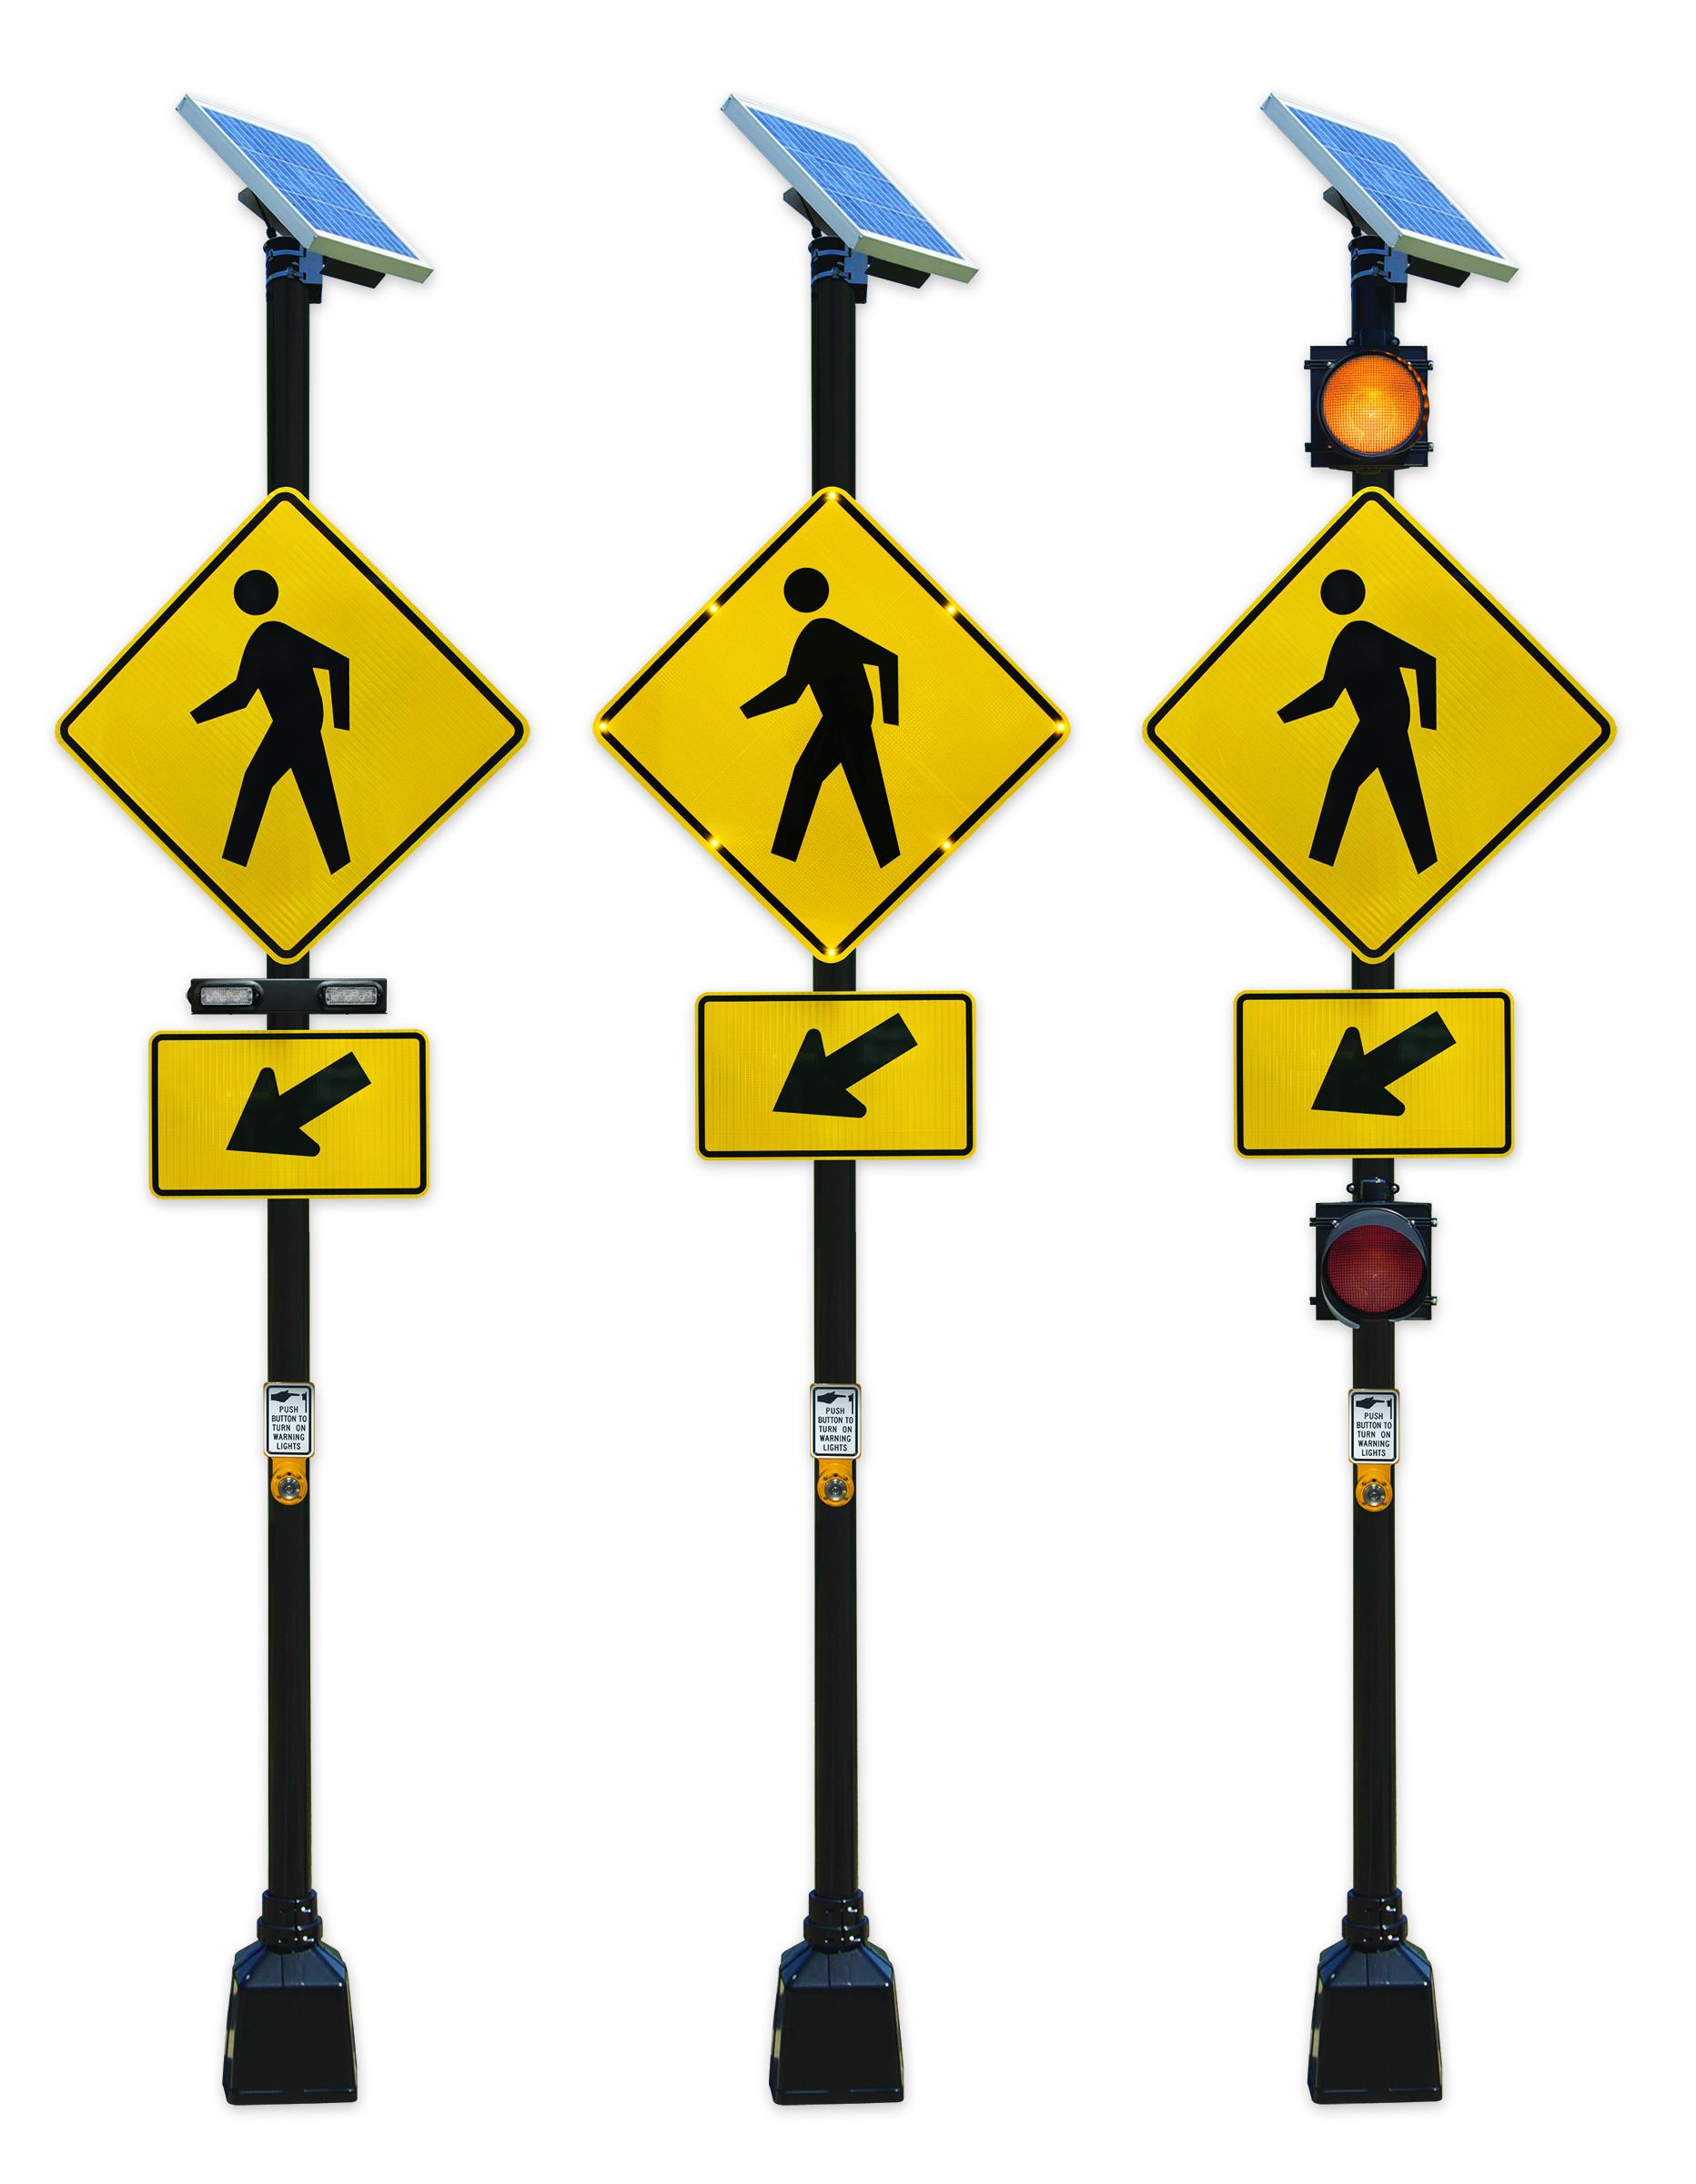 DC_PedestrianCrossingSetOf3_Sep2018_8t.jpg